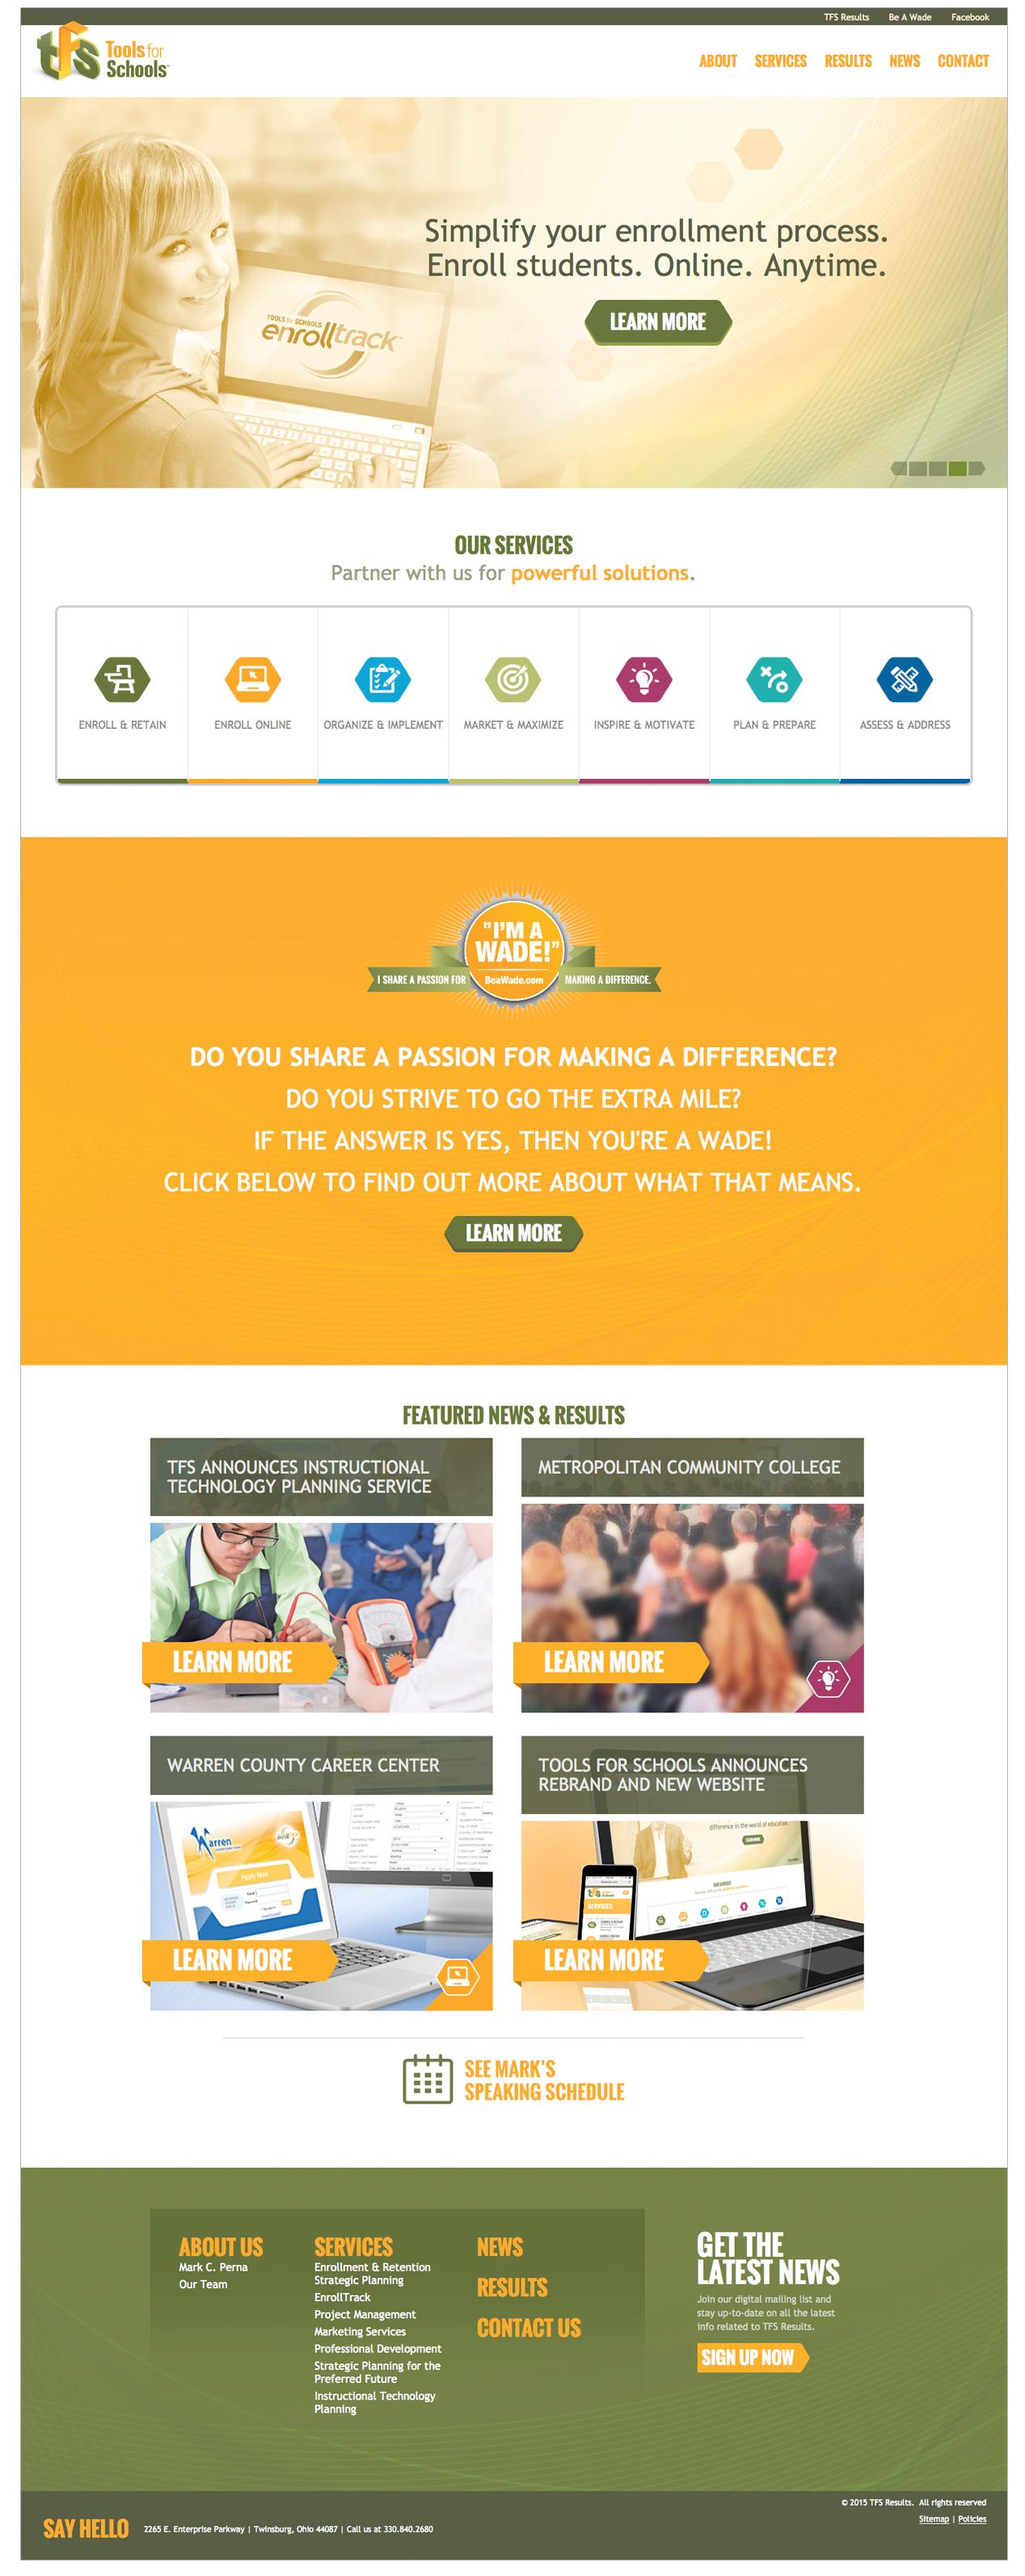 TFS Homepage